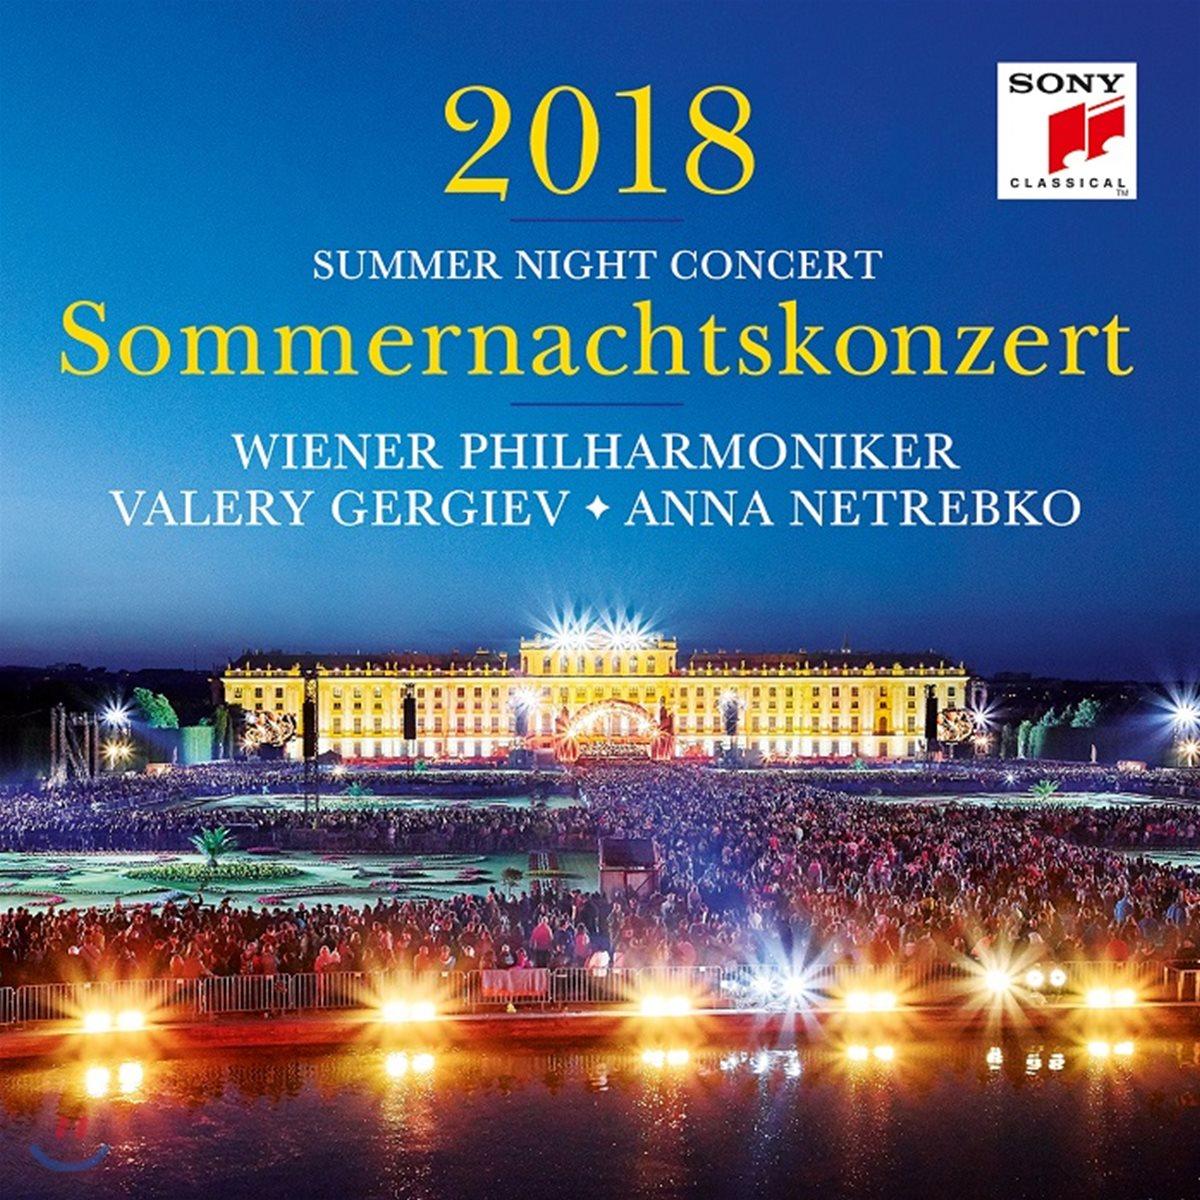 Valery Gergiev 2018 빈 필하모닉 썸머 나잇 콘서트: 여름 음악회 (Summer Night Concert 2018)